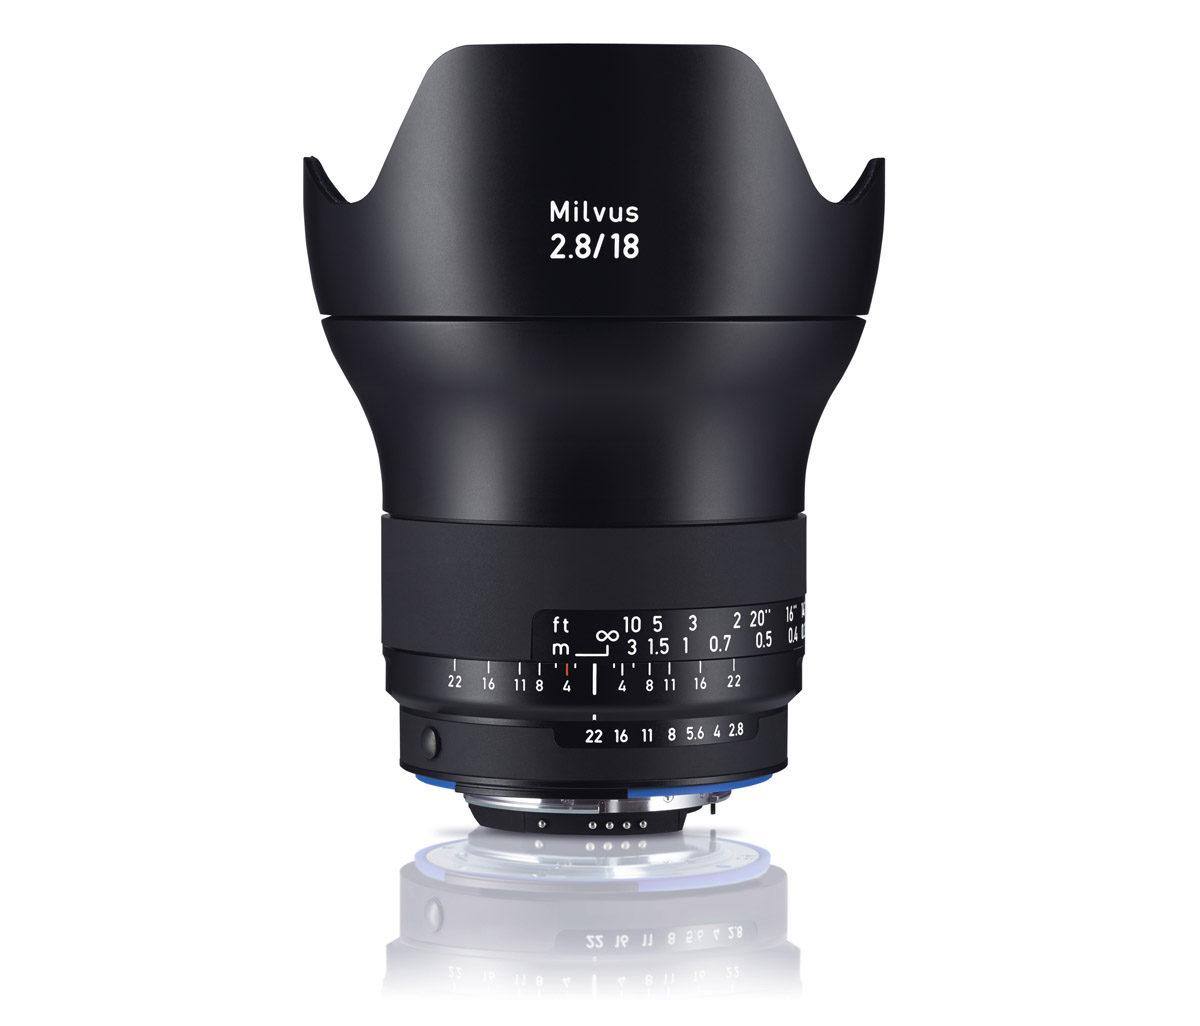 Zeiss Milvus 18 mm F2,8 supervidvinkel Nikon-fattning